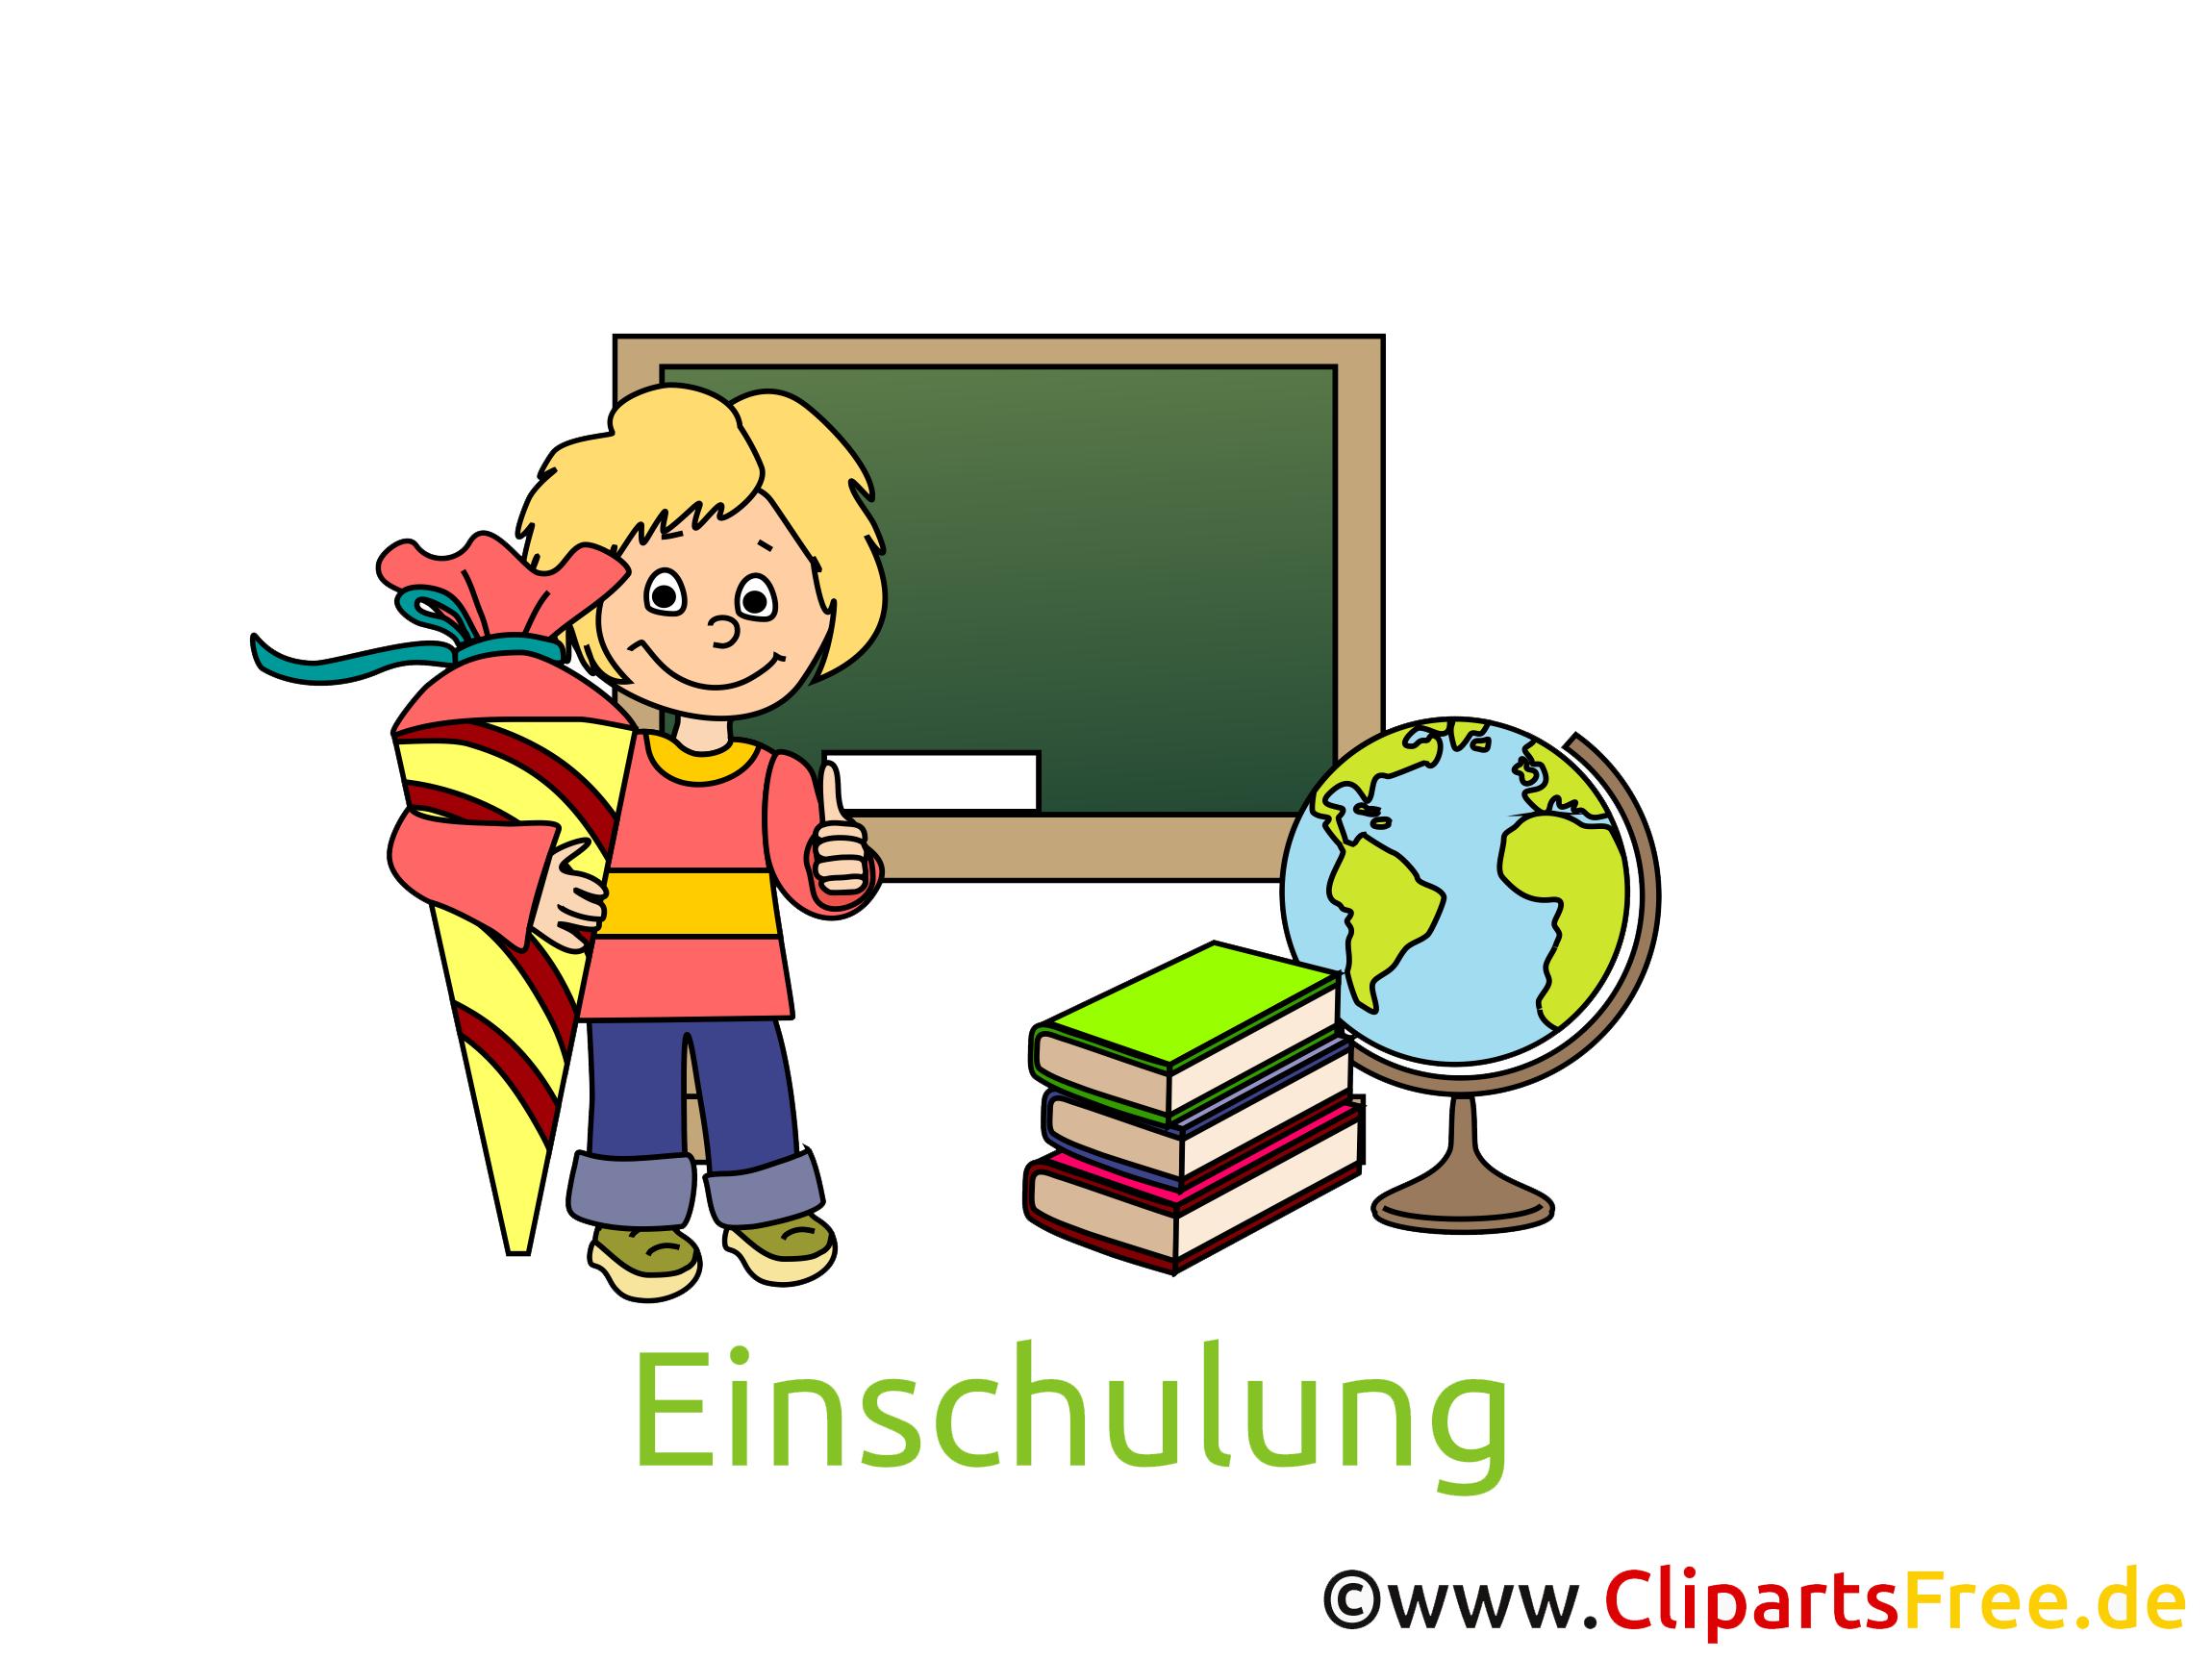 Clipart kostenlos schulanfang svg royalty free download Einschulung Bilder, Cliparts, Cartoons, Grafiken, Illustrationen ... svg royalty free download